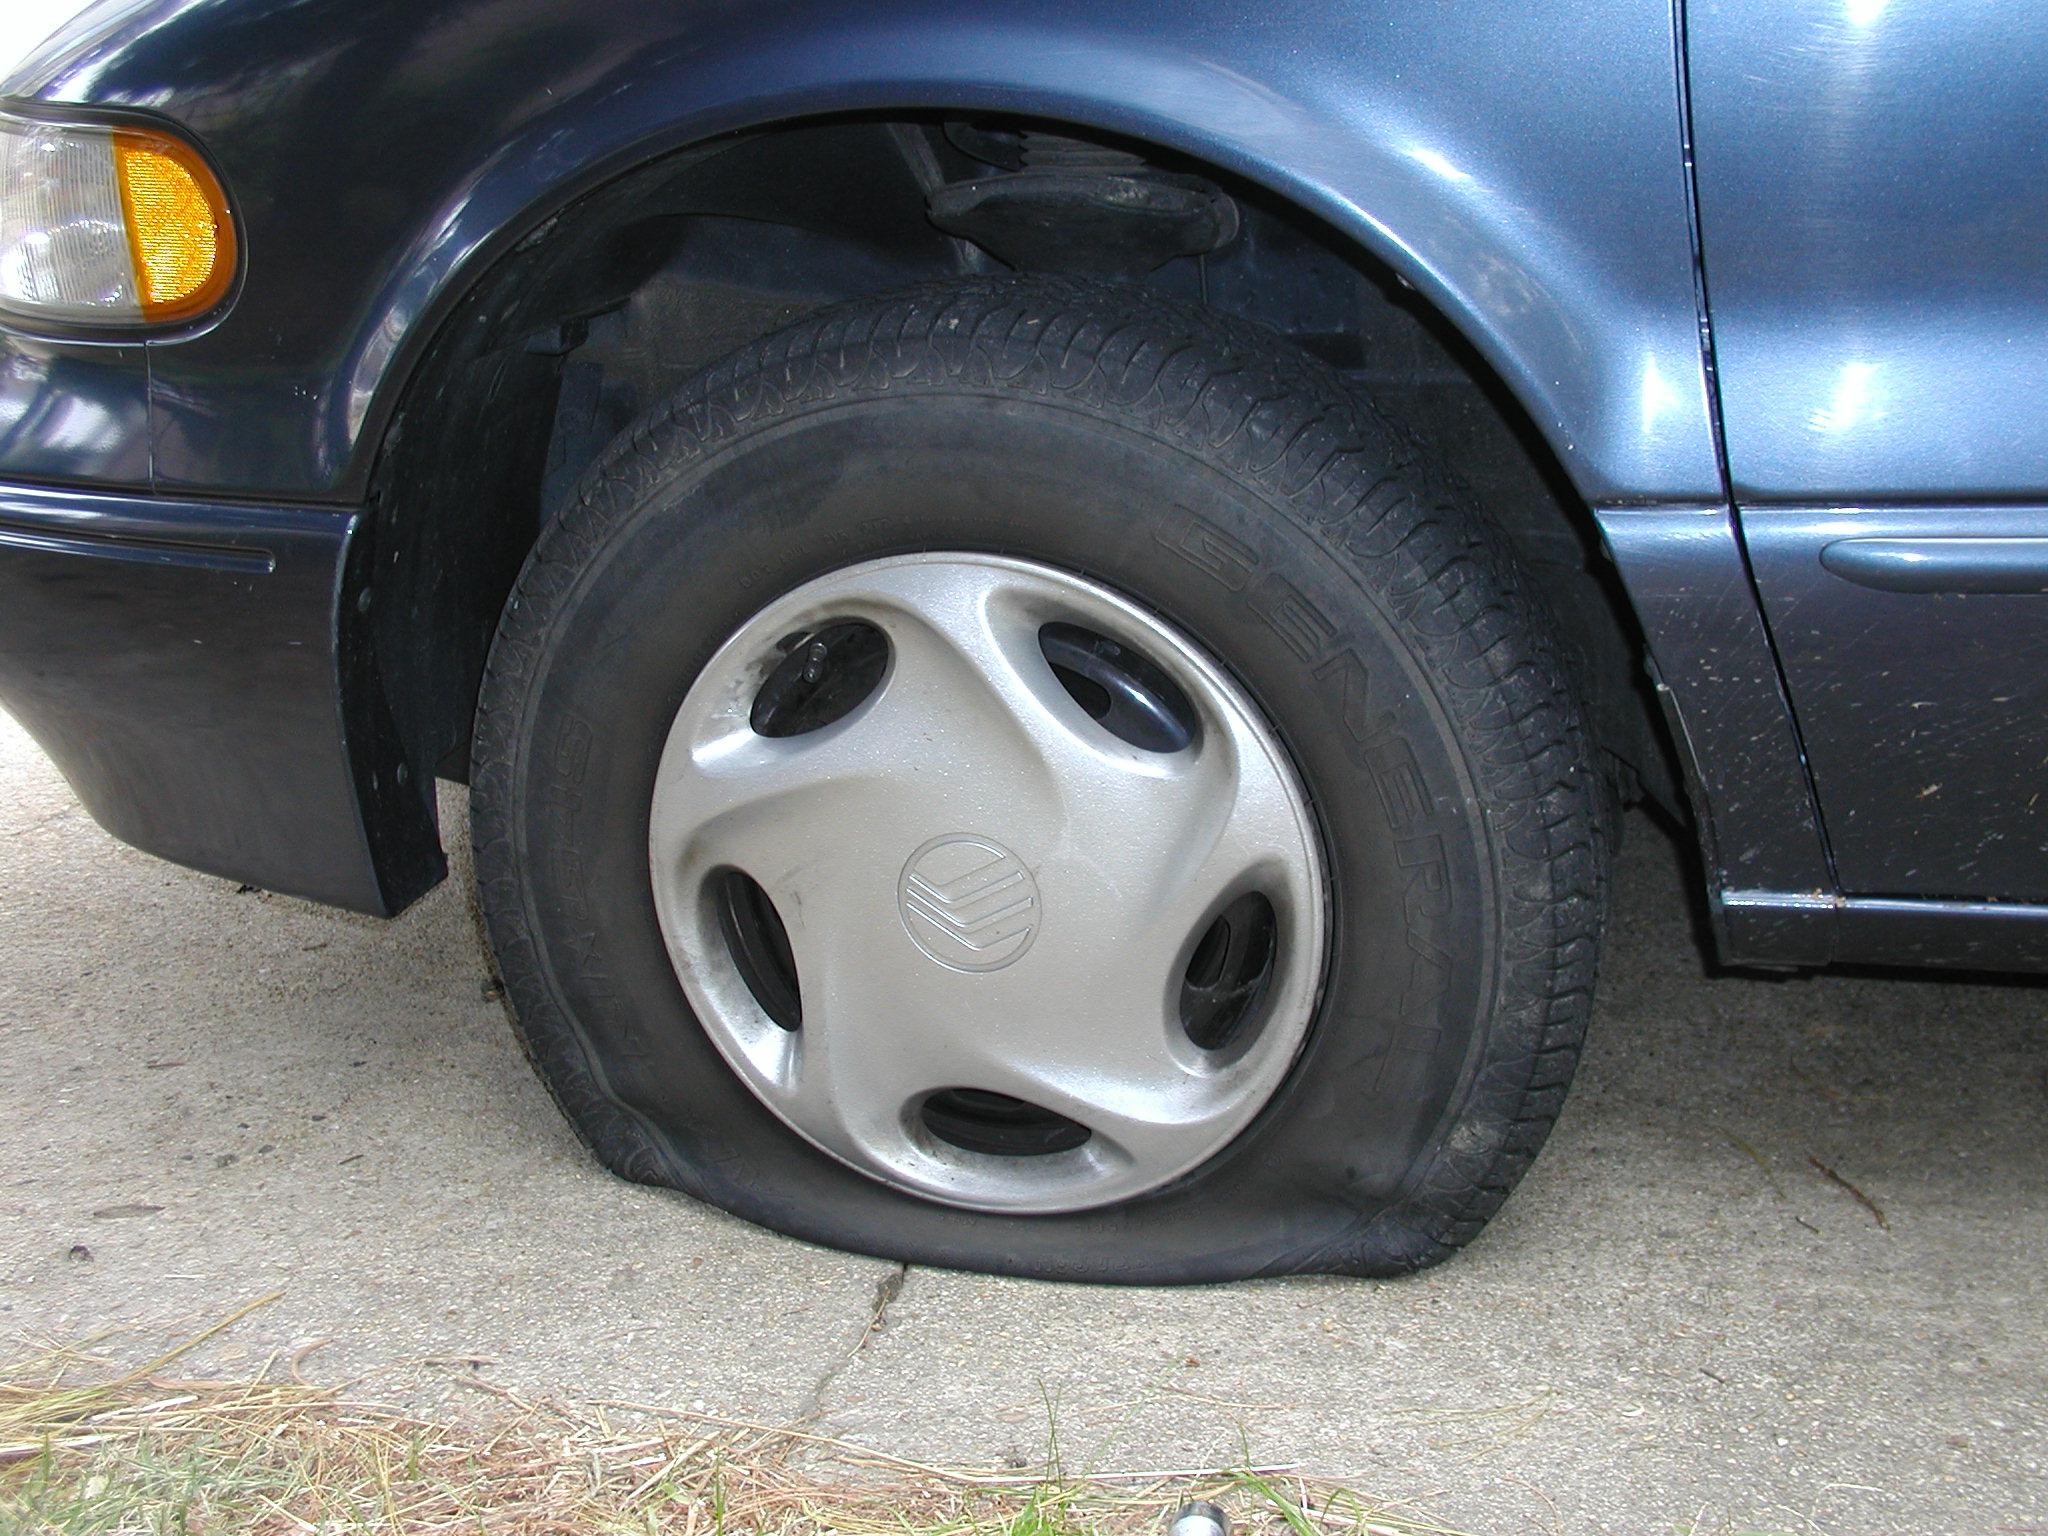 File:Flat Tire.JPG - Wikimedia Commons